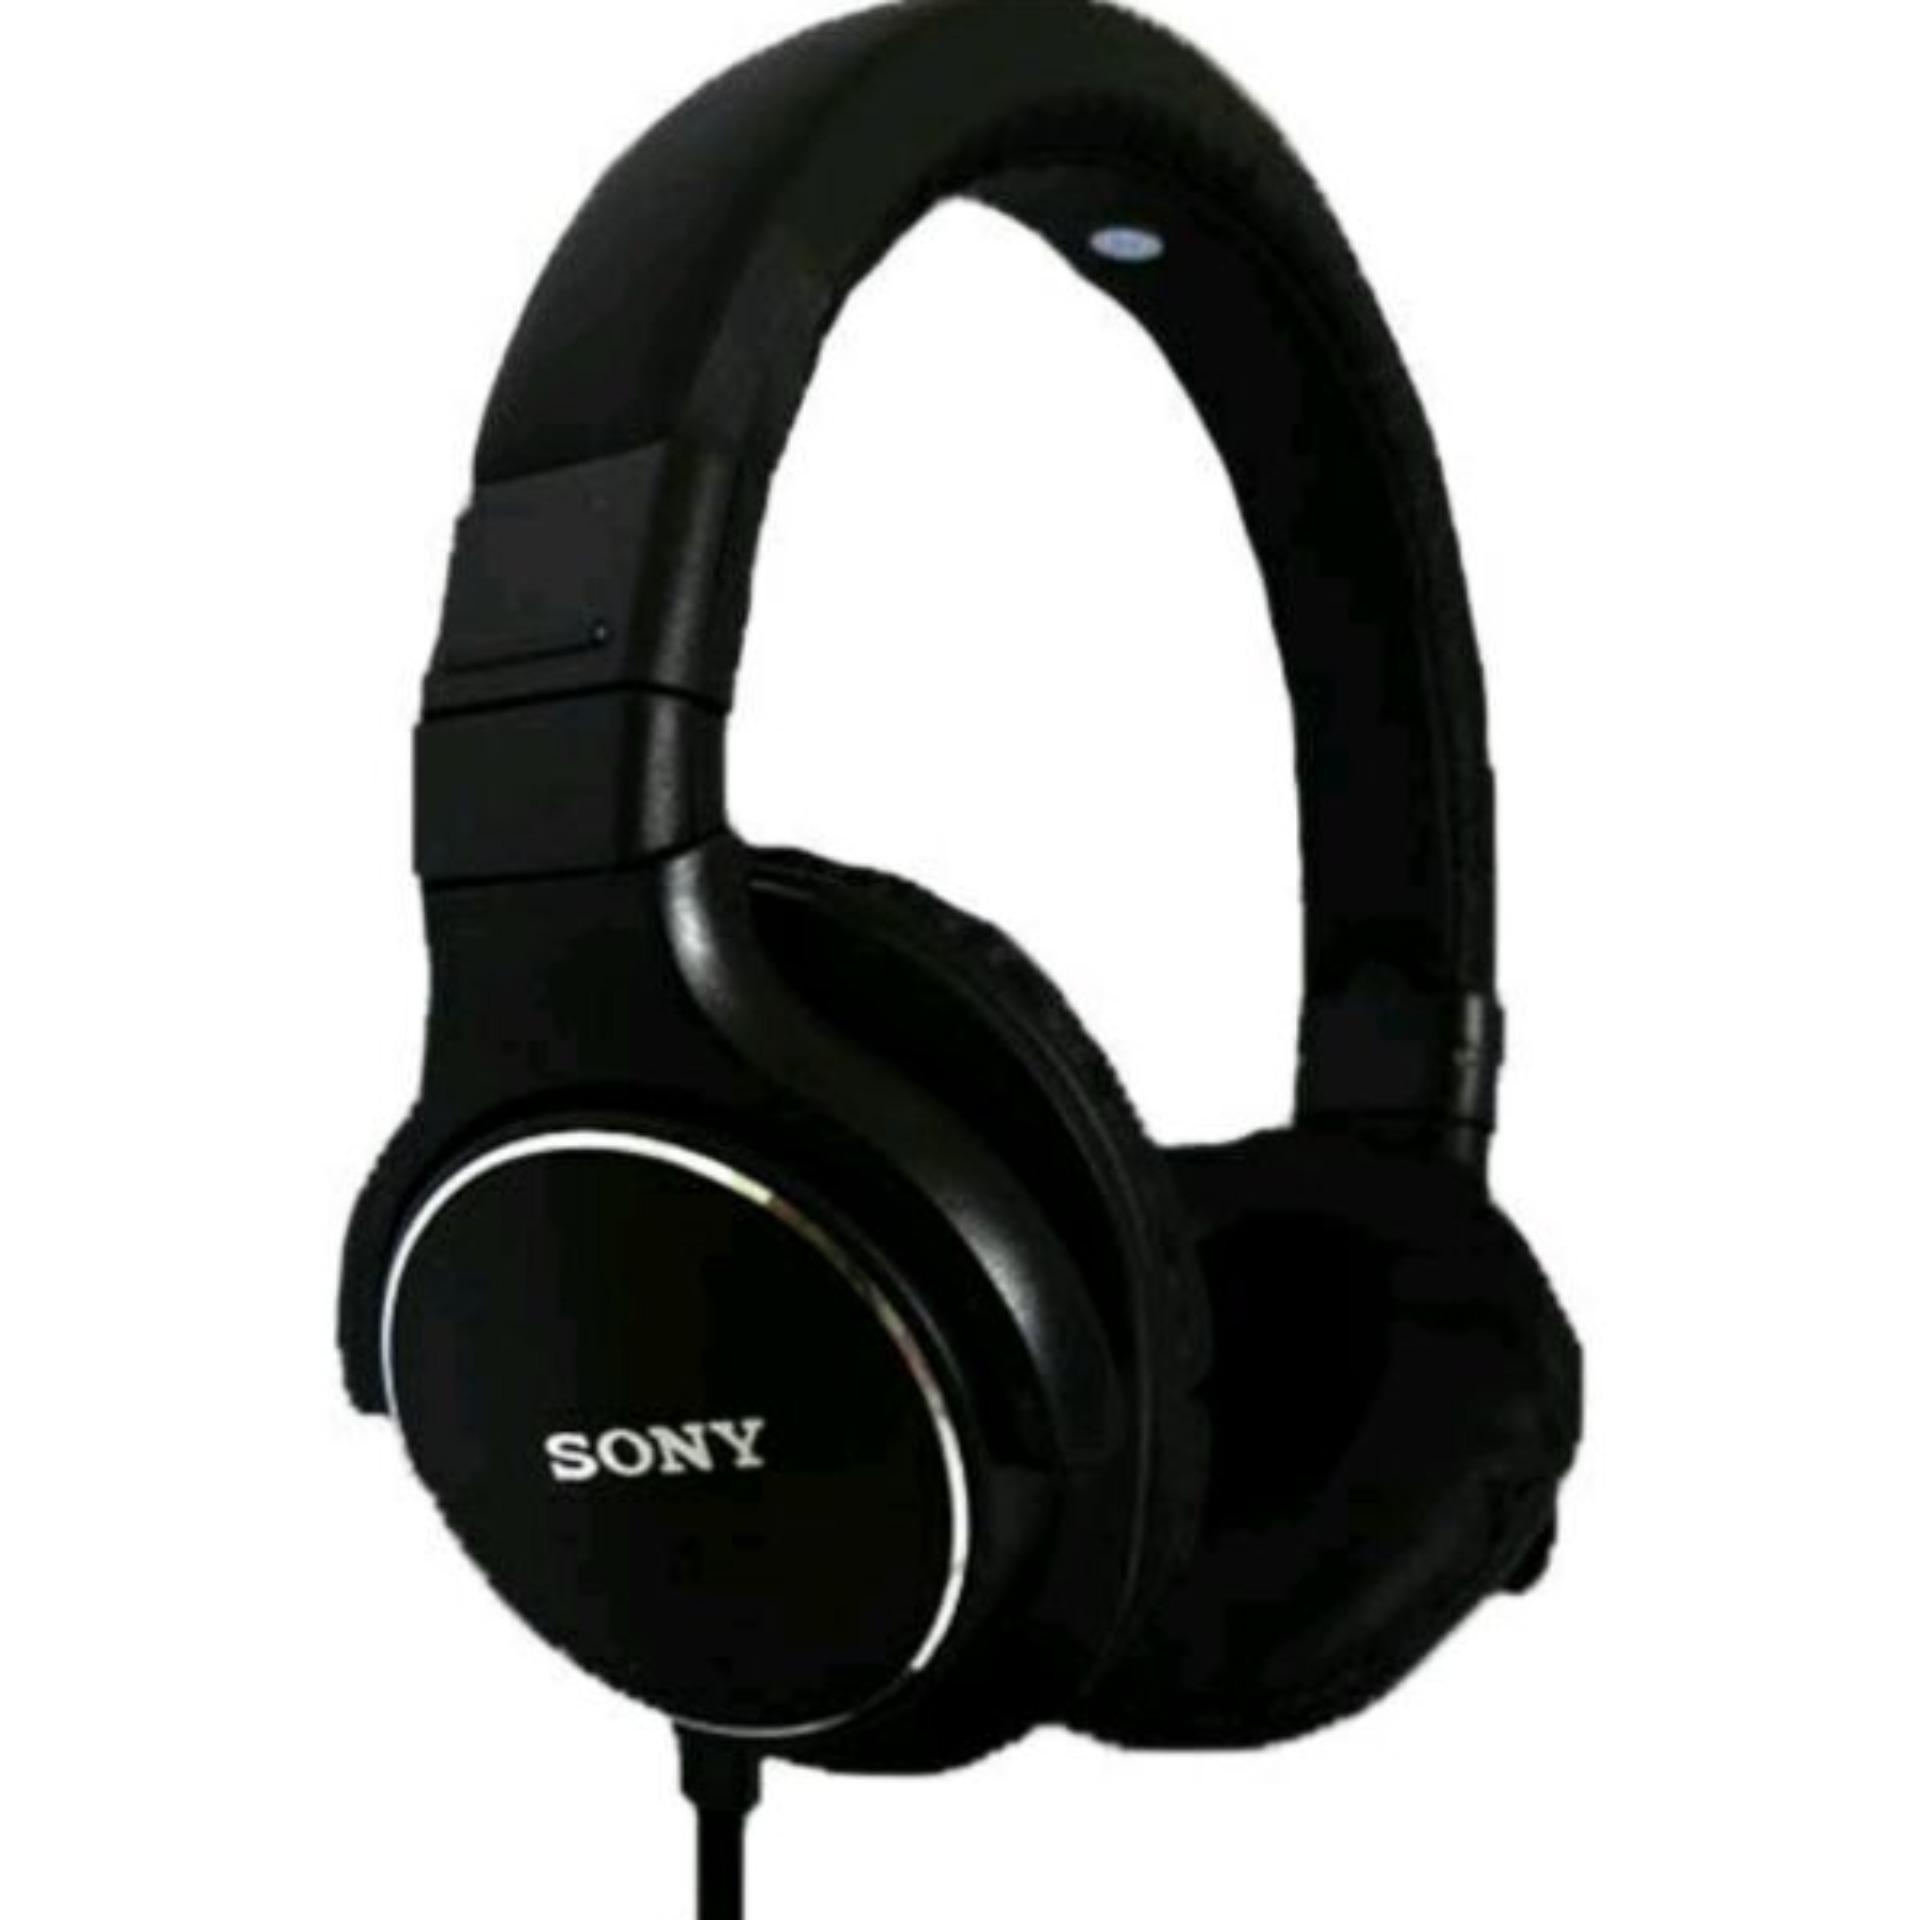 sony extra bass headphones. sony extra bass headphones